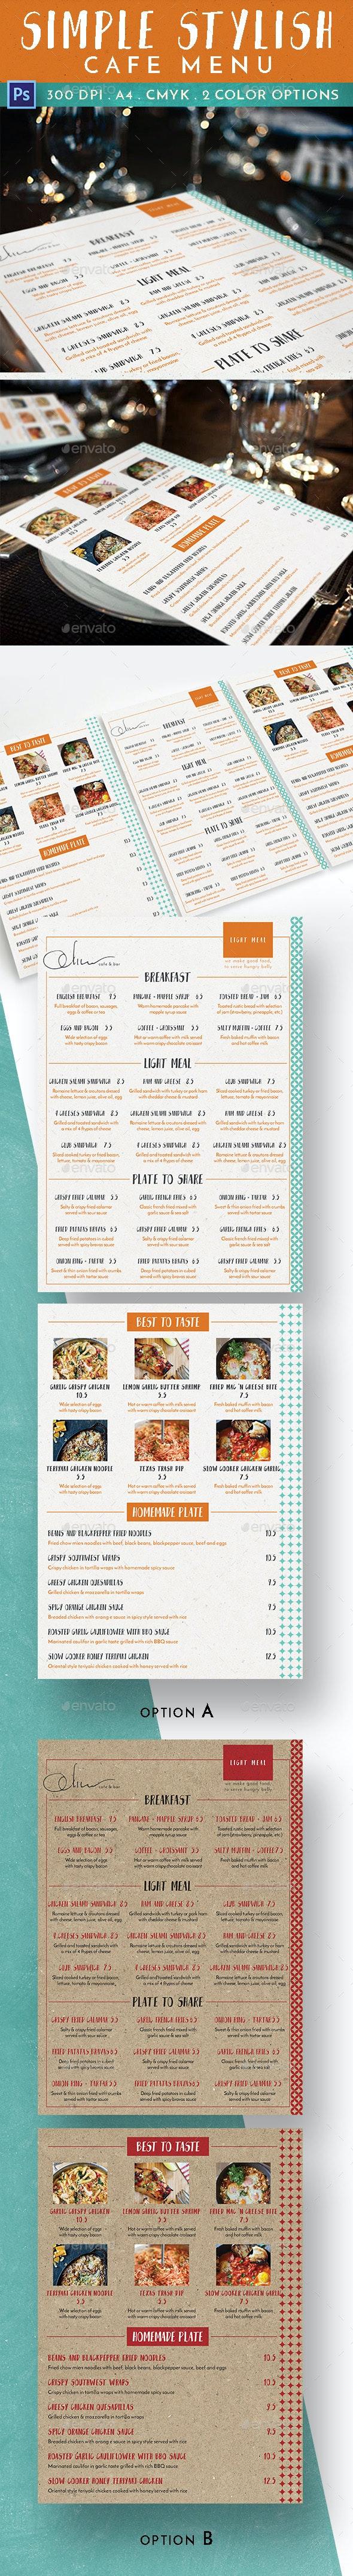 Simple Stylish Cafe Menu - Food Menus Print Templates